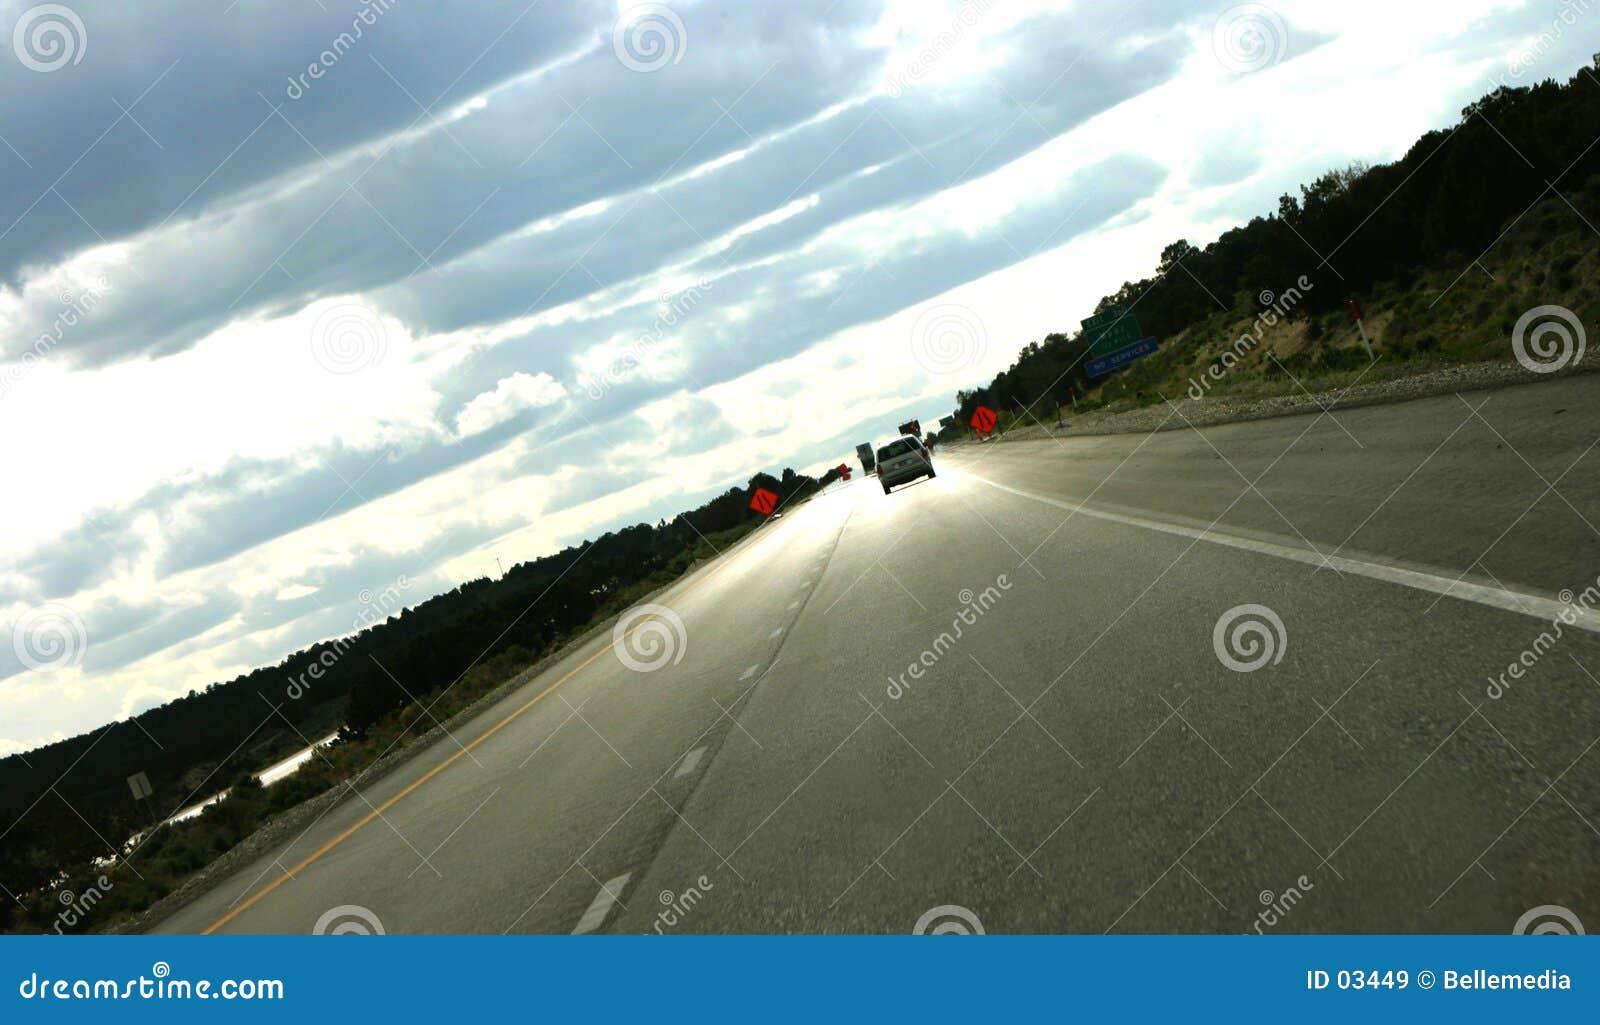 Road - Danger ahead!